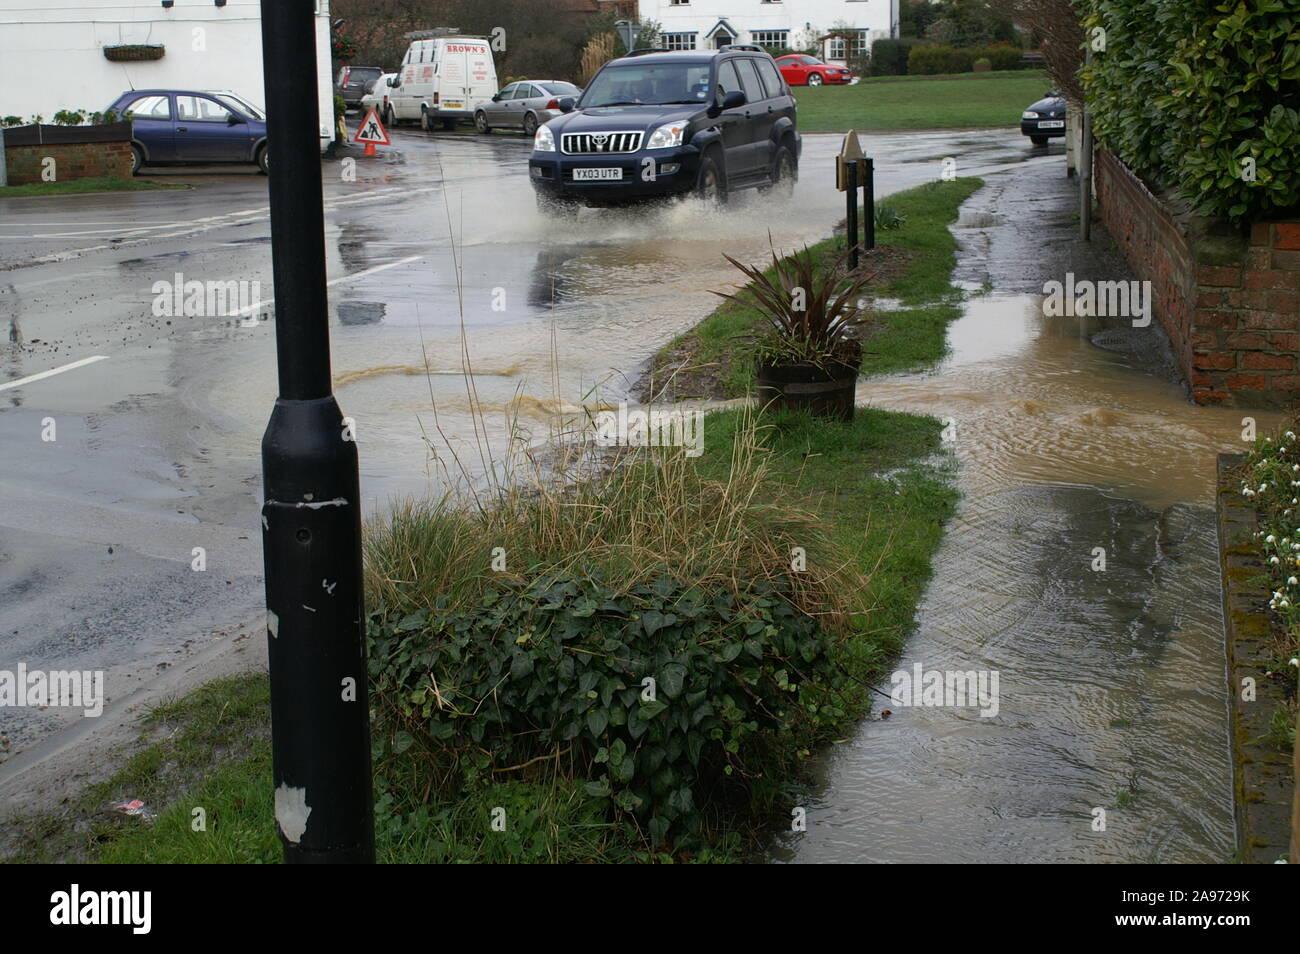 Flooding, South yorkshire Stock Photo